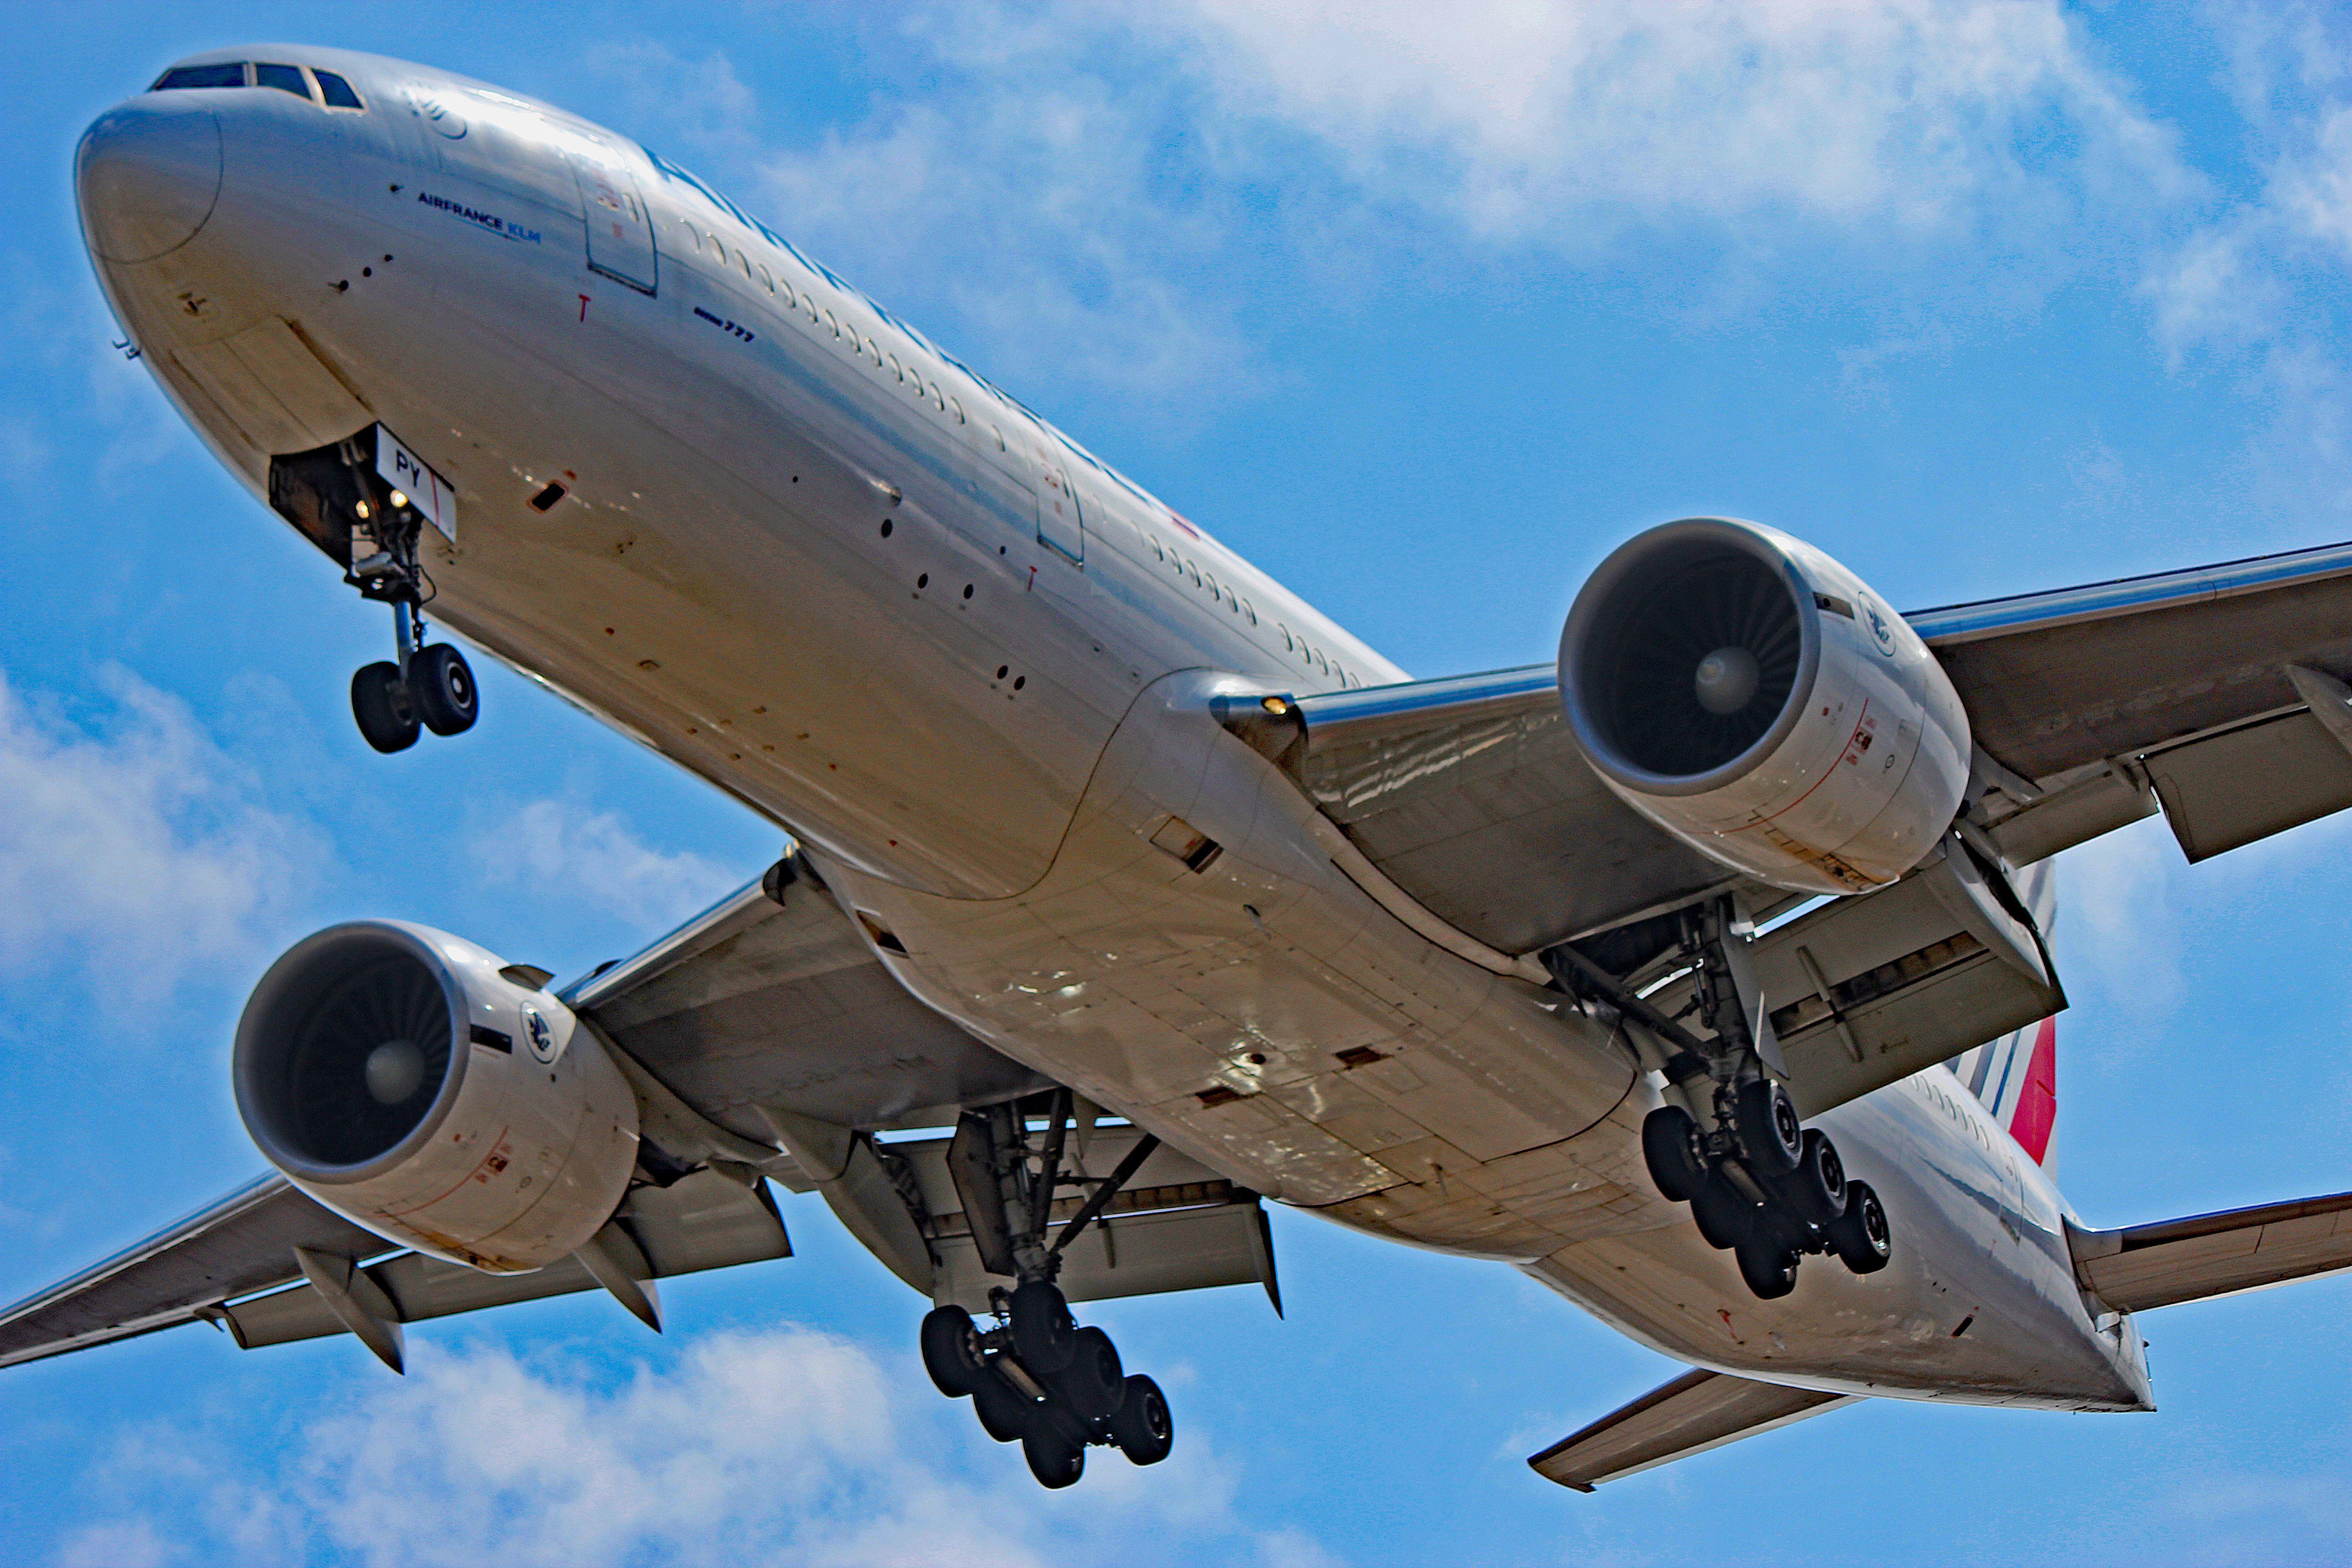 FGSPY Images Of Air France Boeing 777200ER Boeing 777